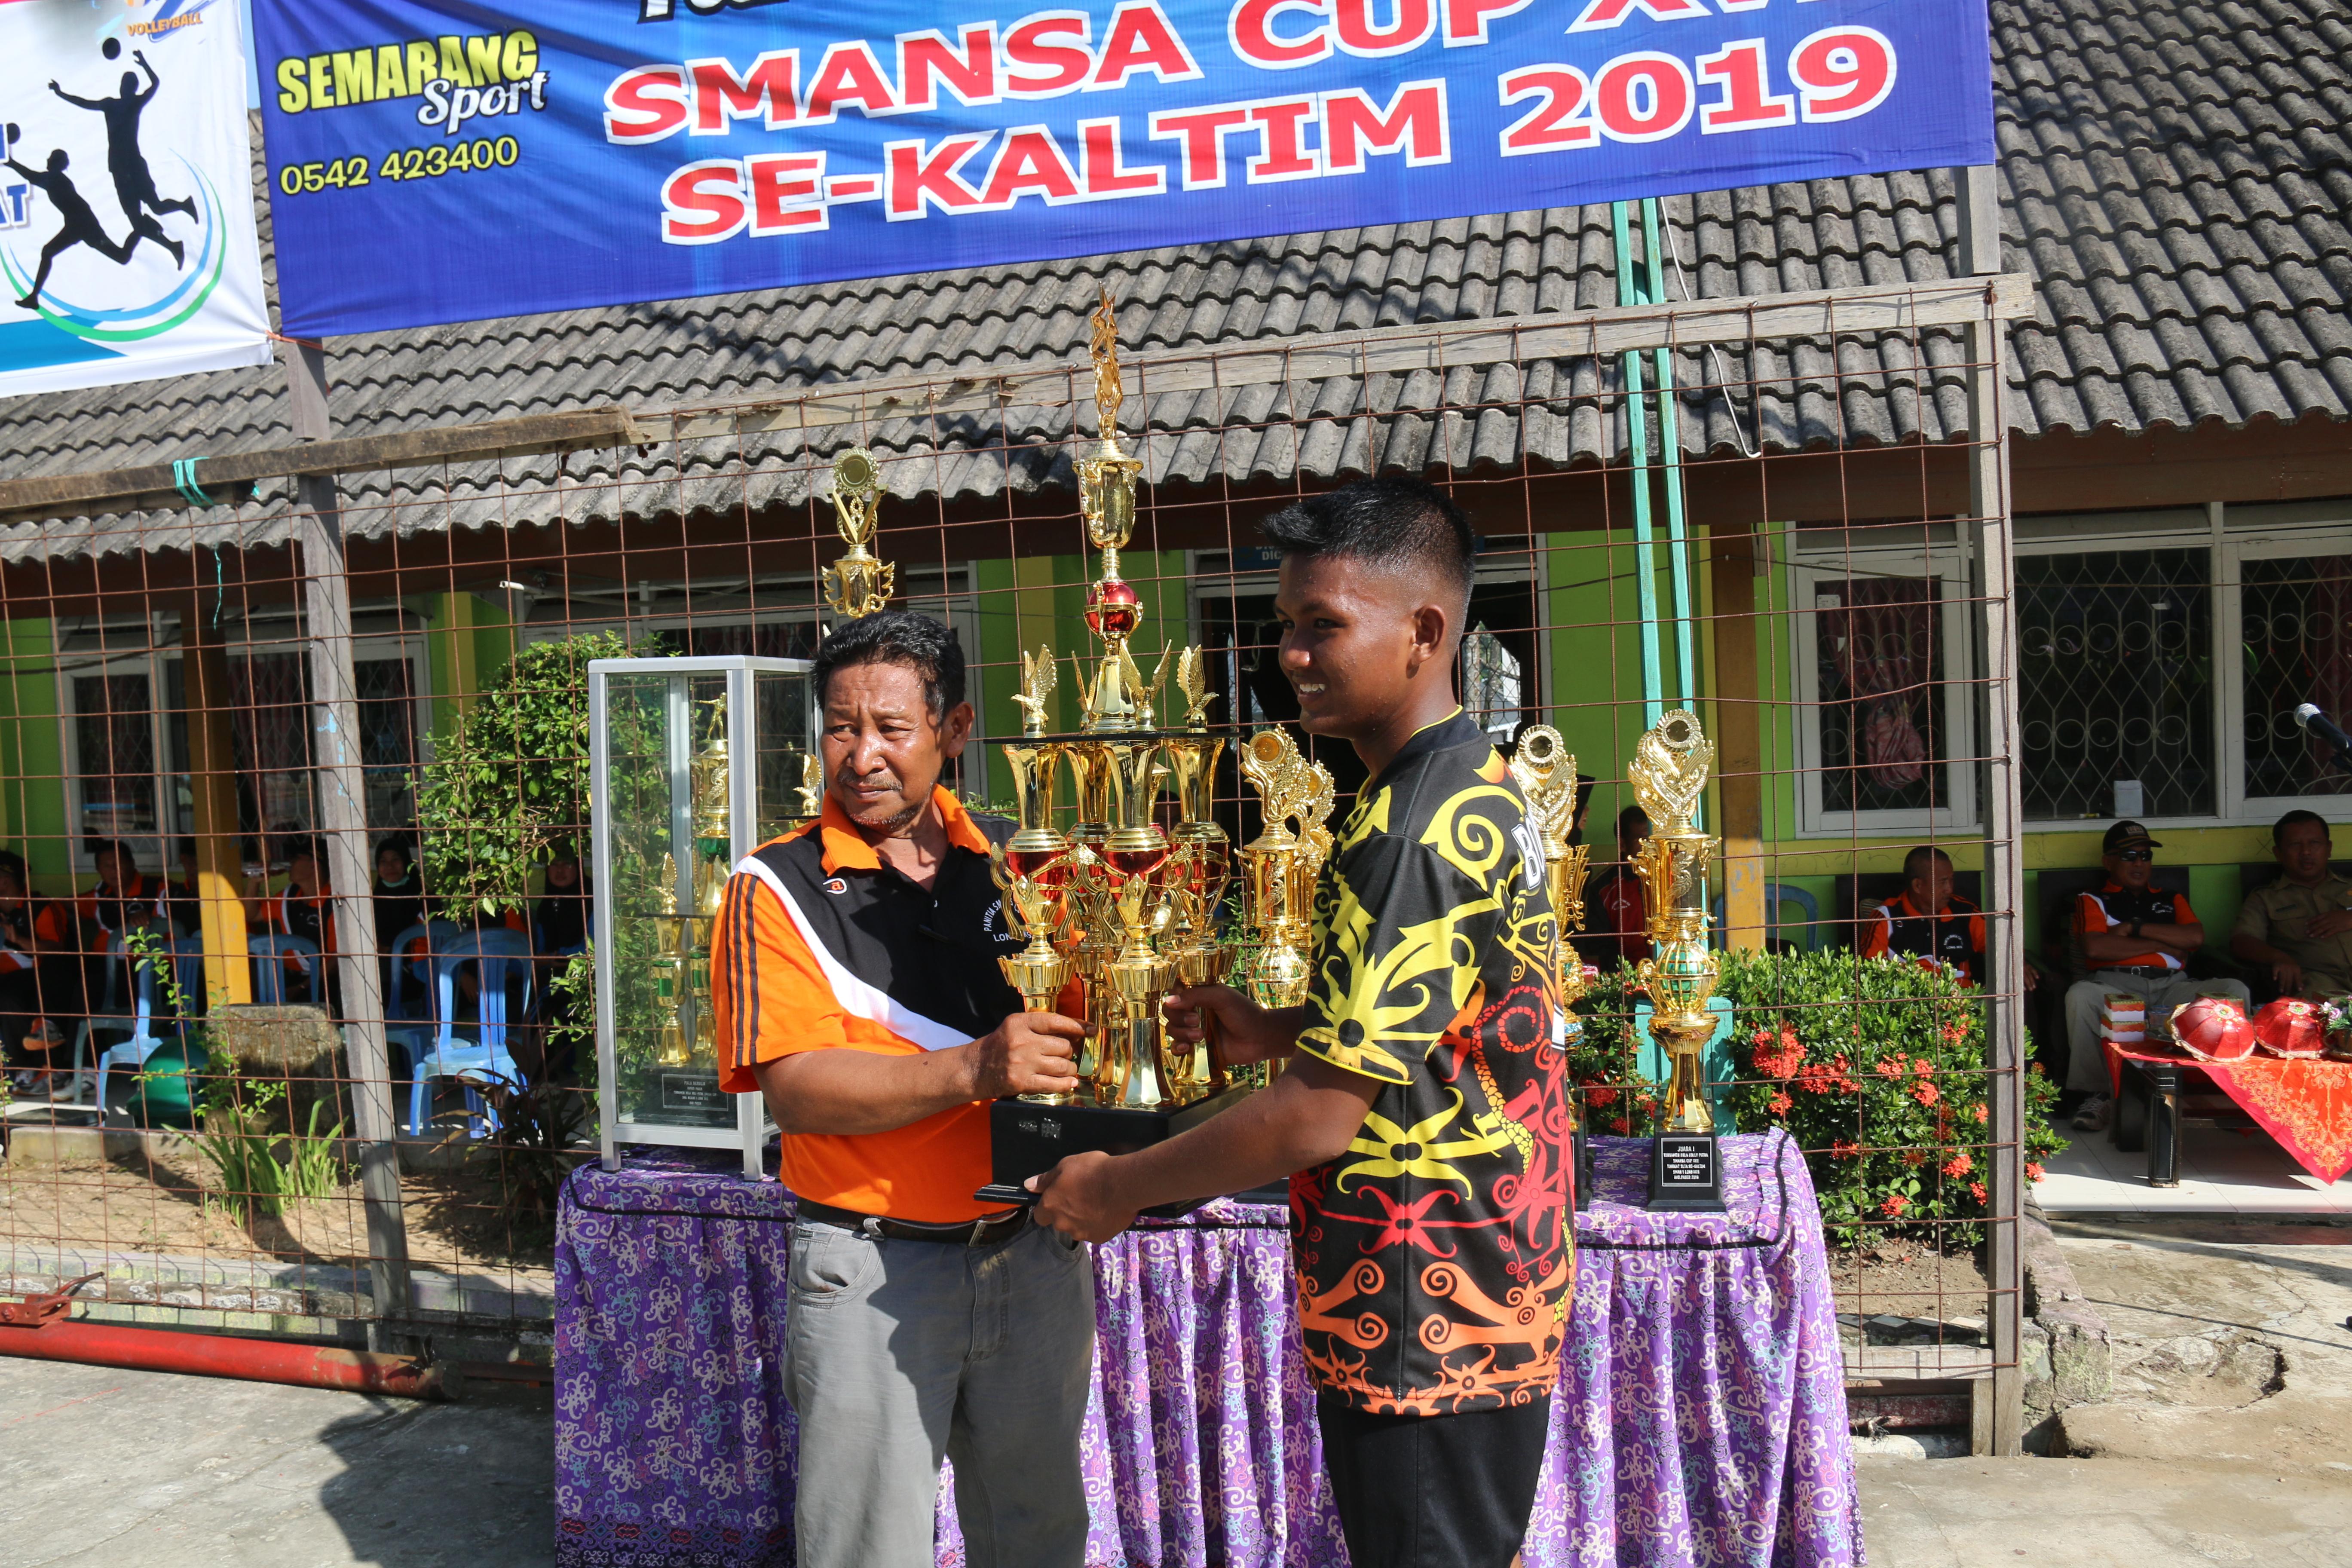 Smansa Cup ke XVII se Kaltim, Menuju Prestasi dan Jalin Silaturahmi